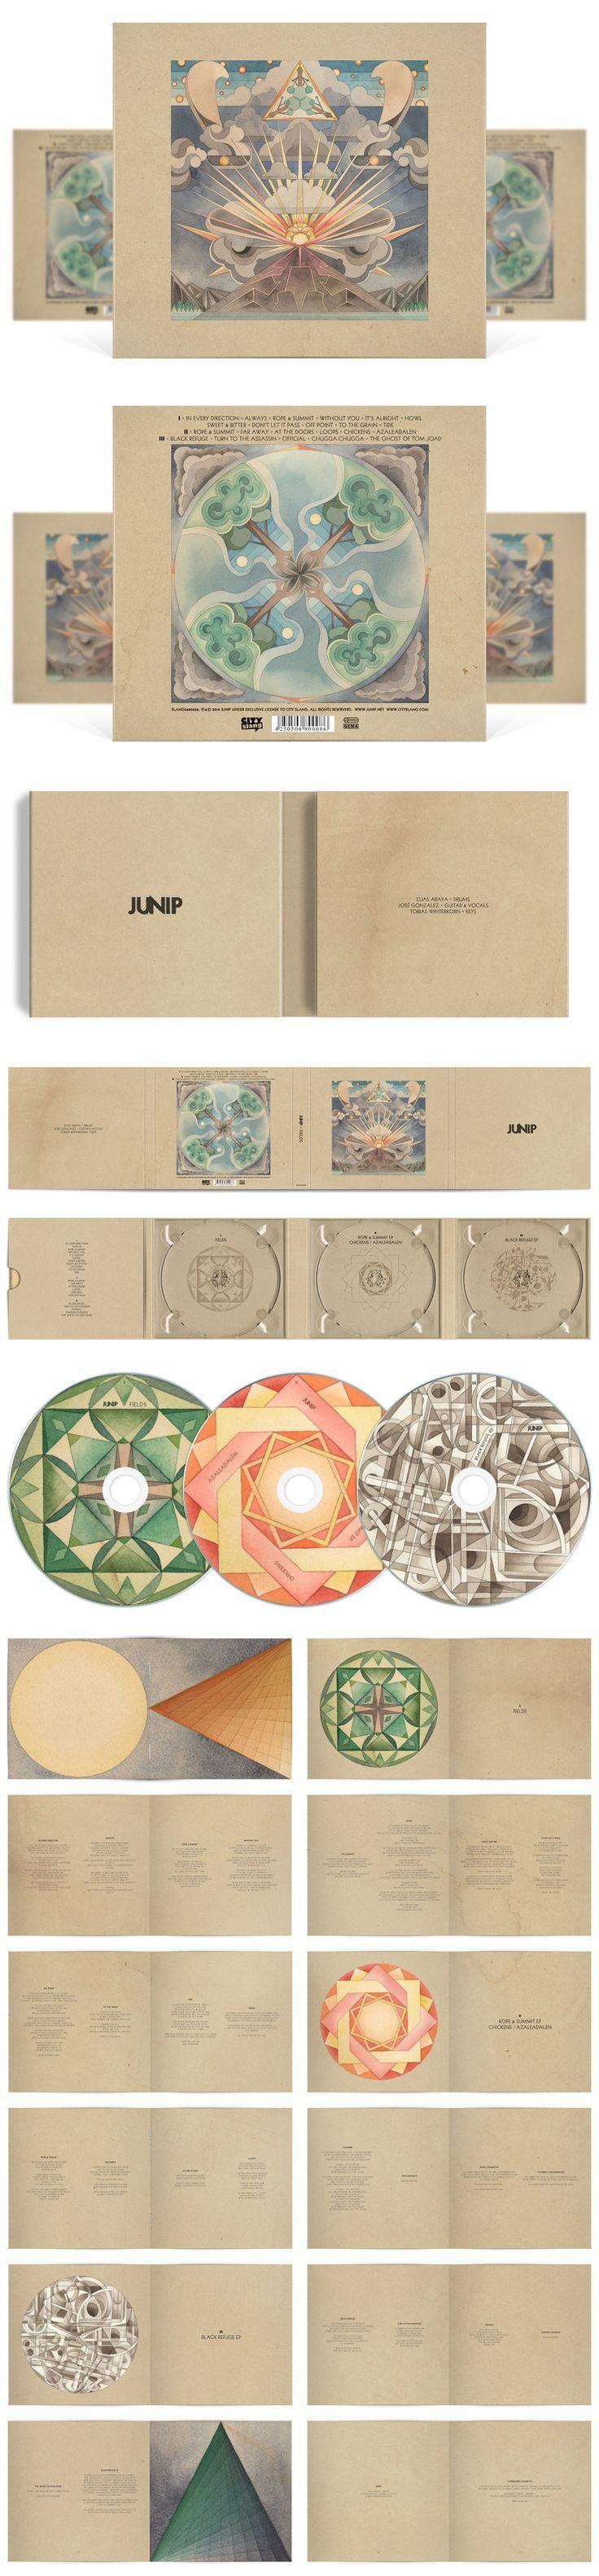 Junip deluxe CD packaging design (Moondog Entertainment - 2010)